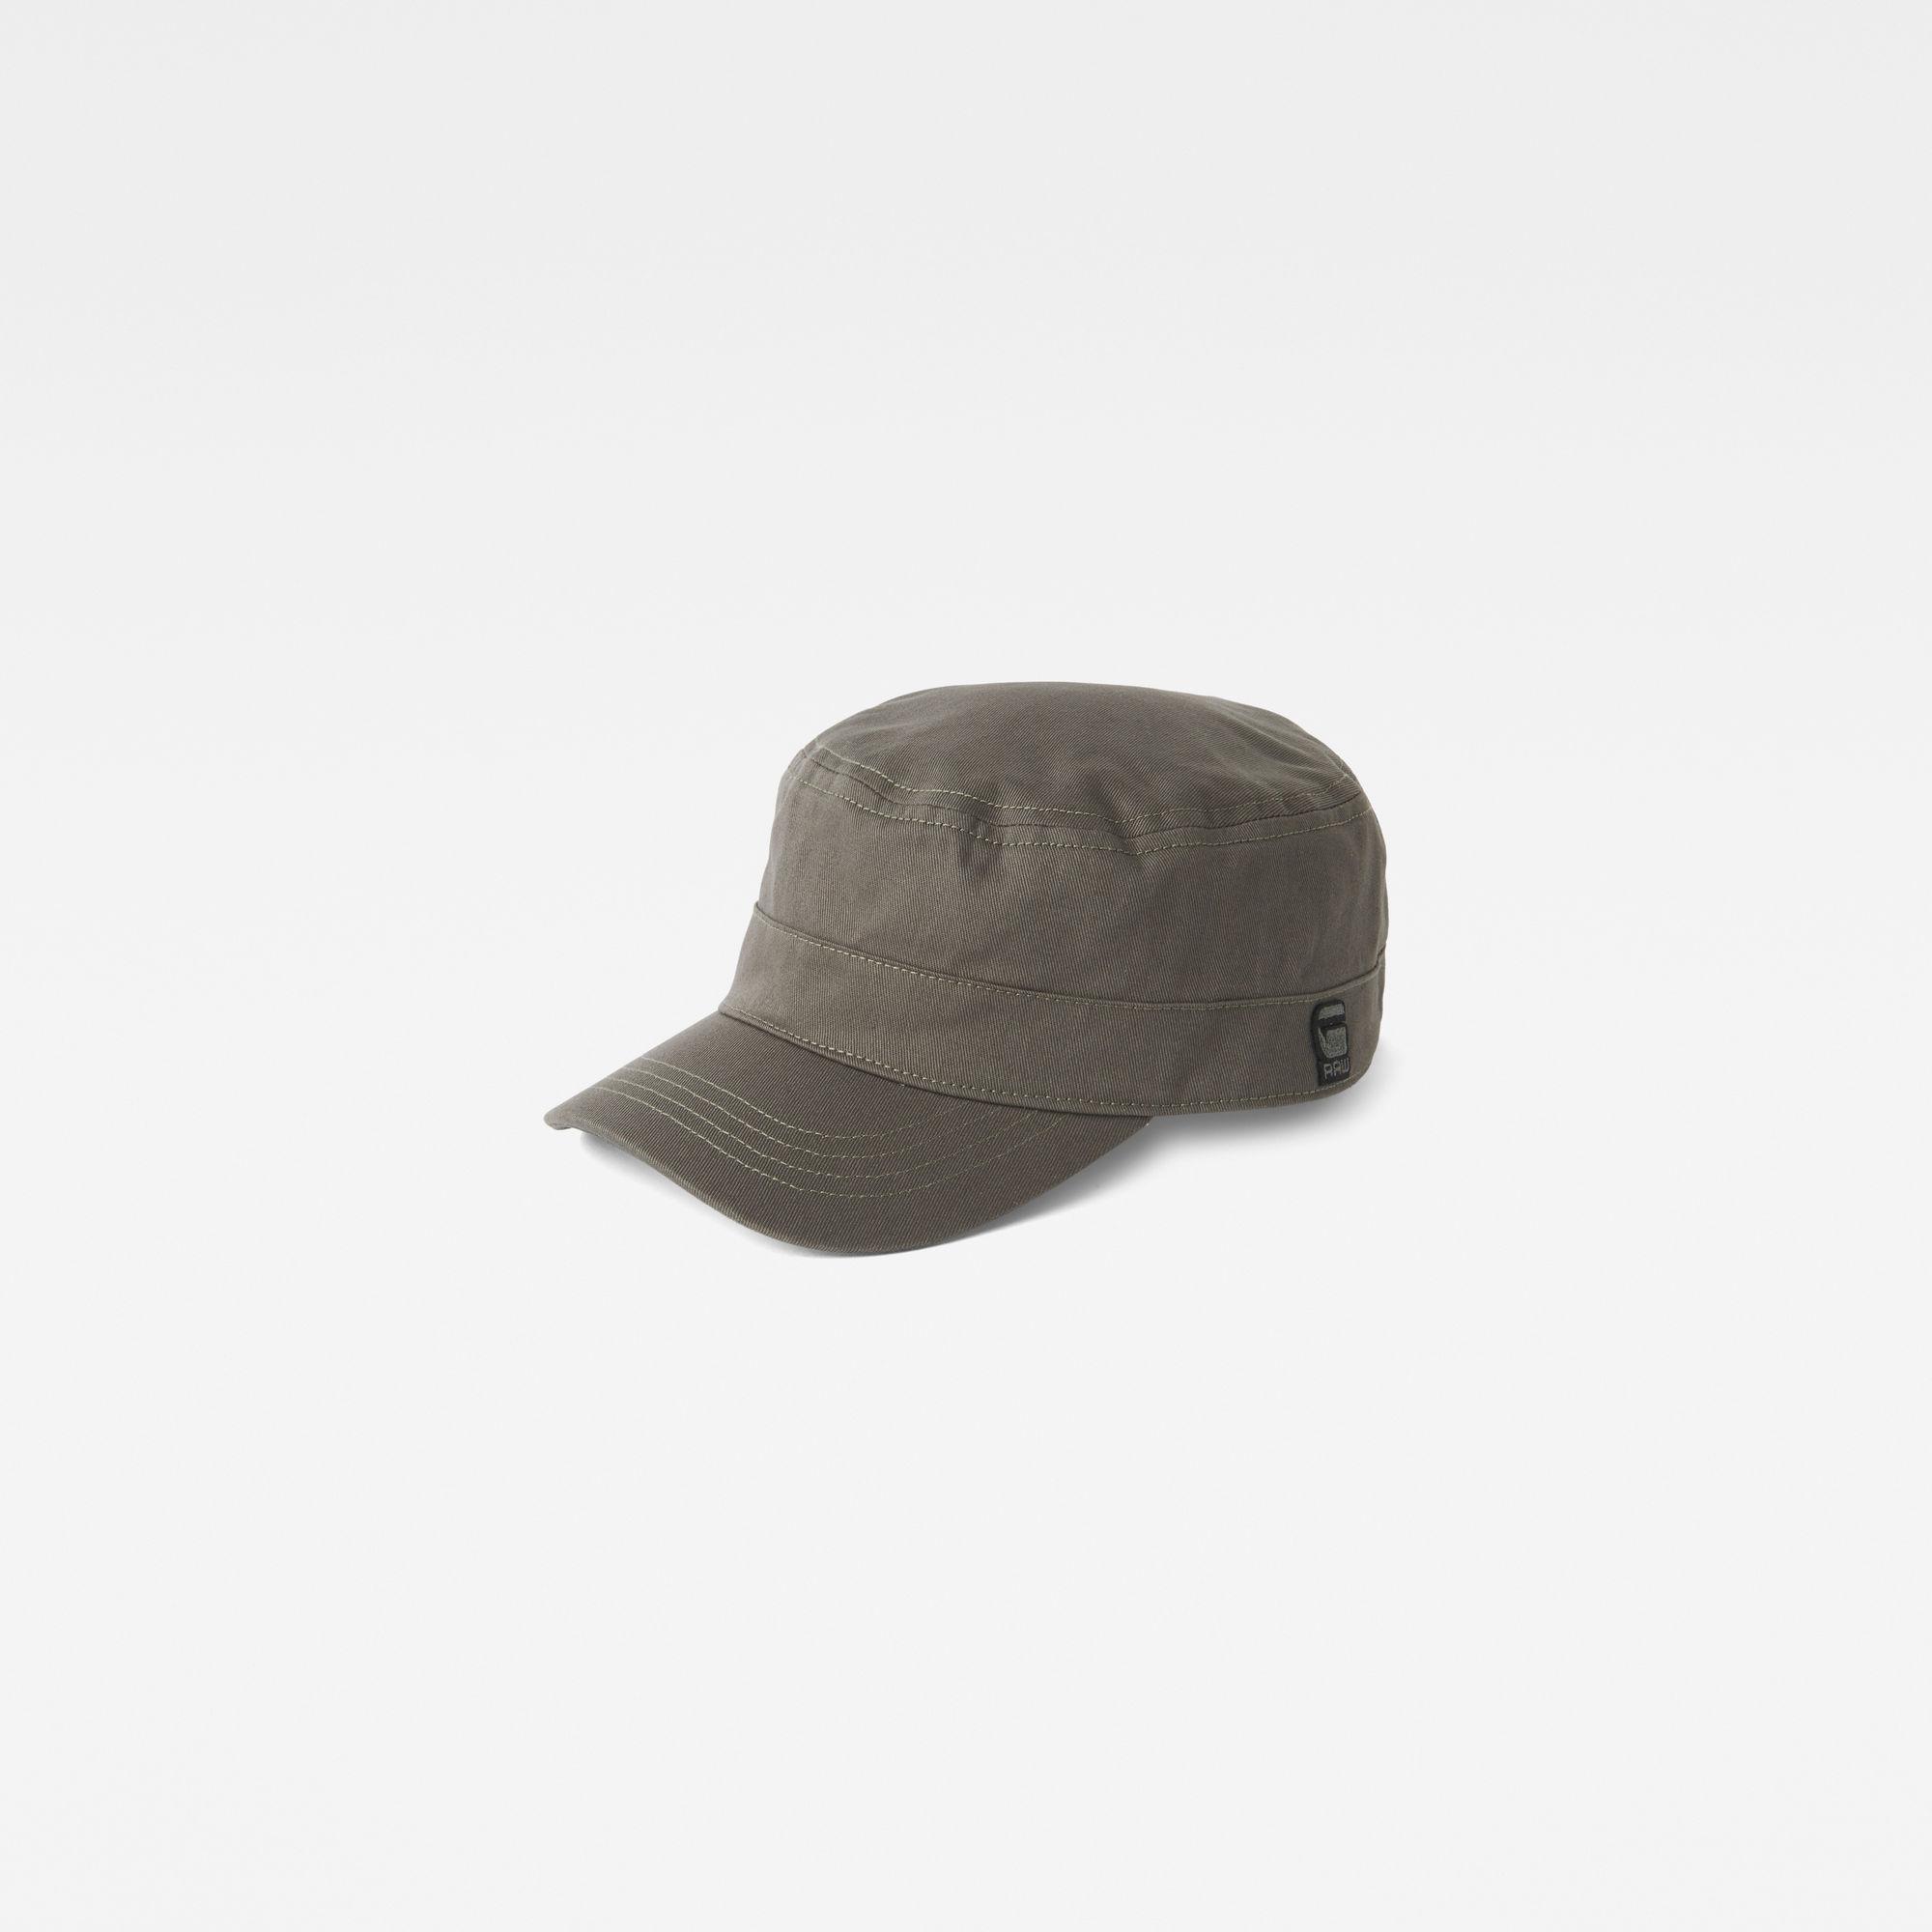 Drego duty cap